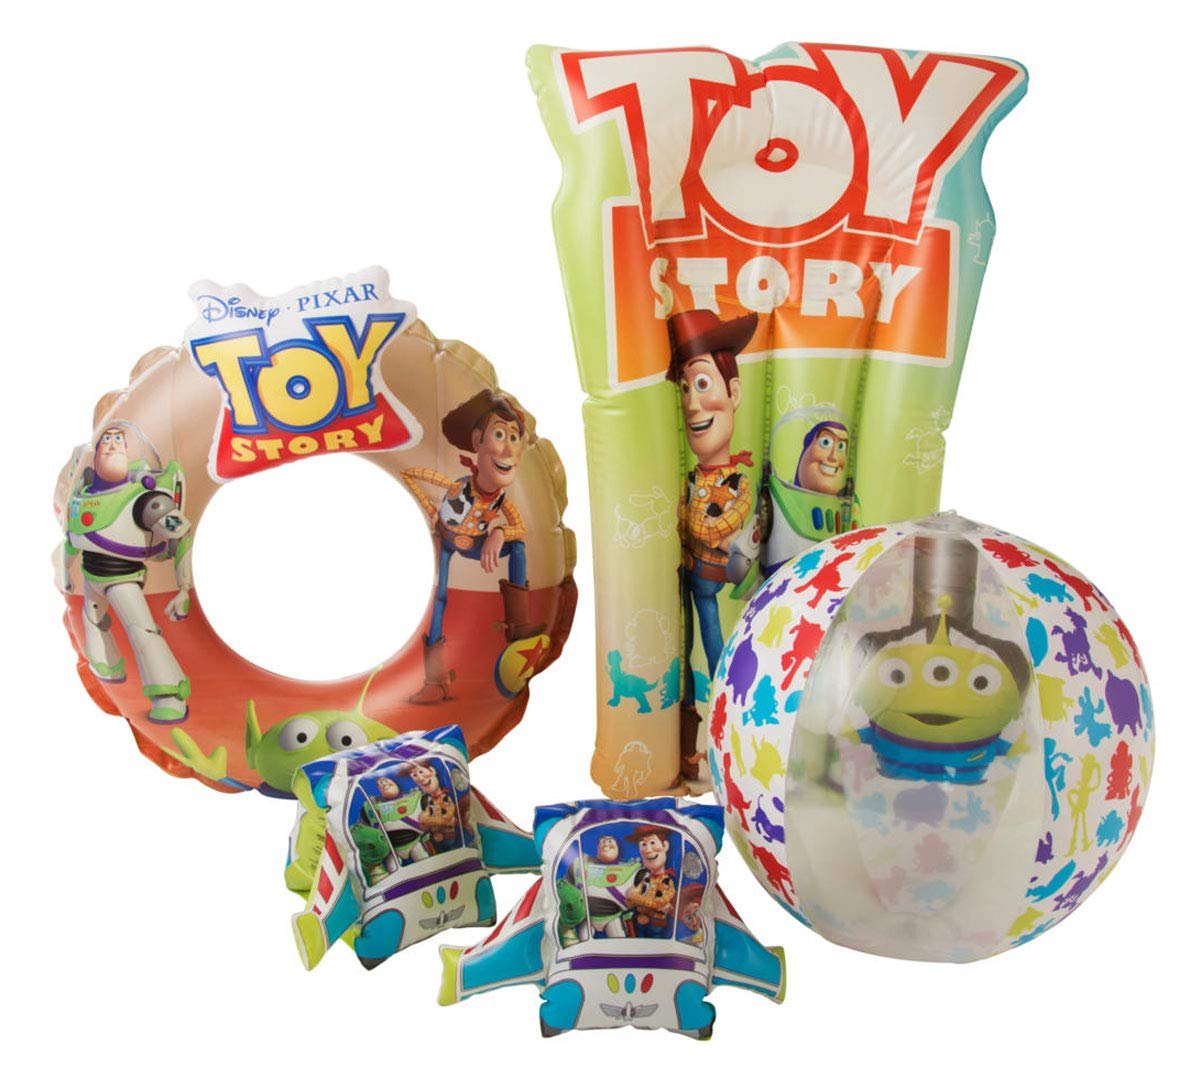 Pixar Toy Story 3D Deluxe Swim Set Floats For Children: Amazon.es ...